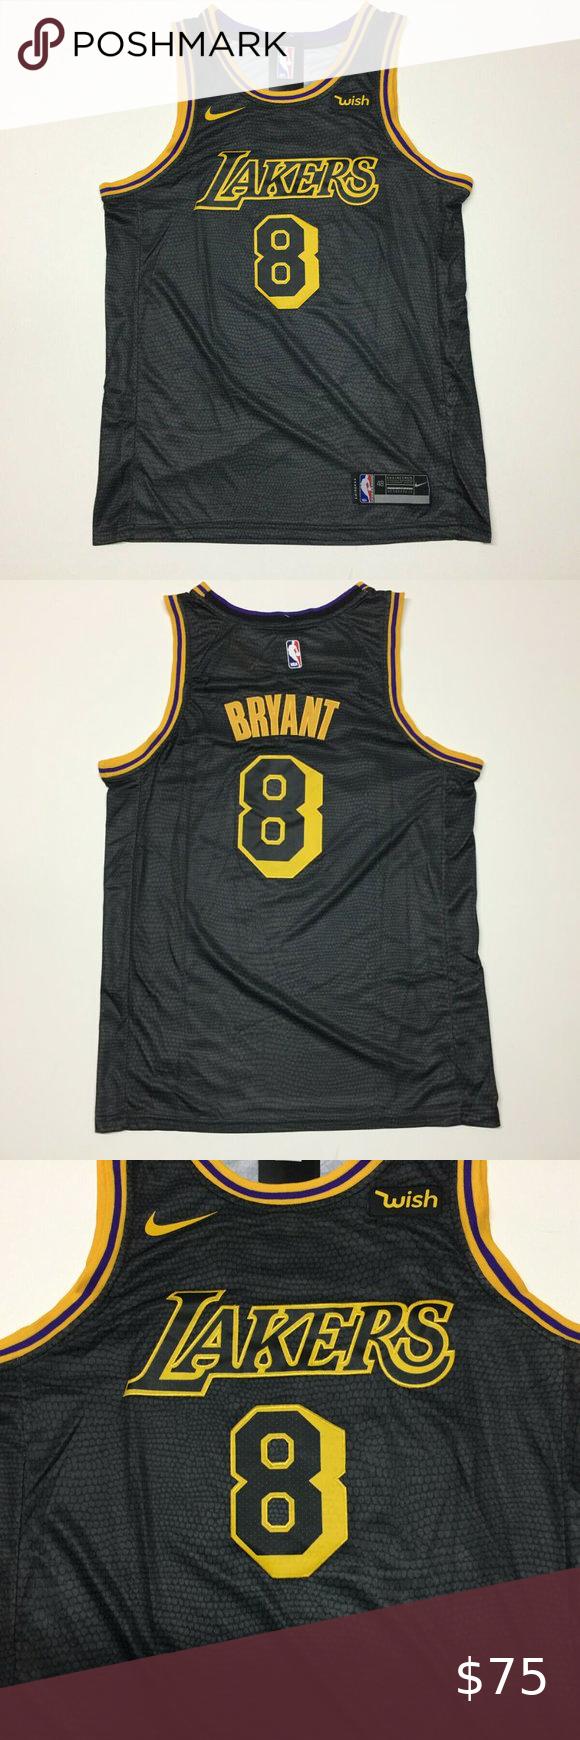 Kobe 8 Sz Xl Lakers Black Mamba City Edition In 2020 Kobe Bryant Black Mamba Black Mamba Kobe Bryant